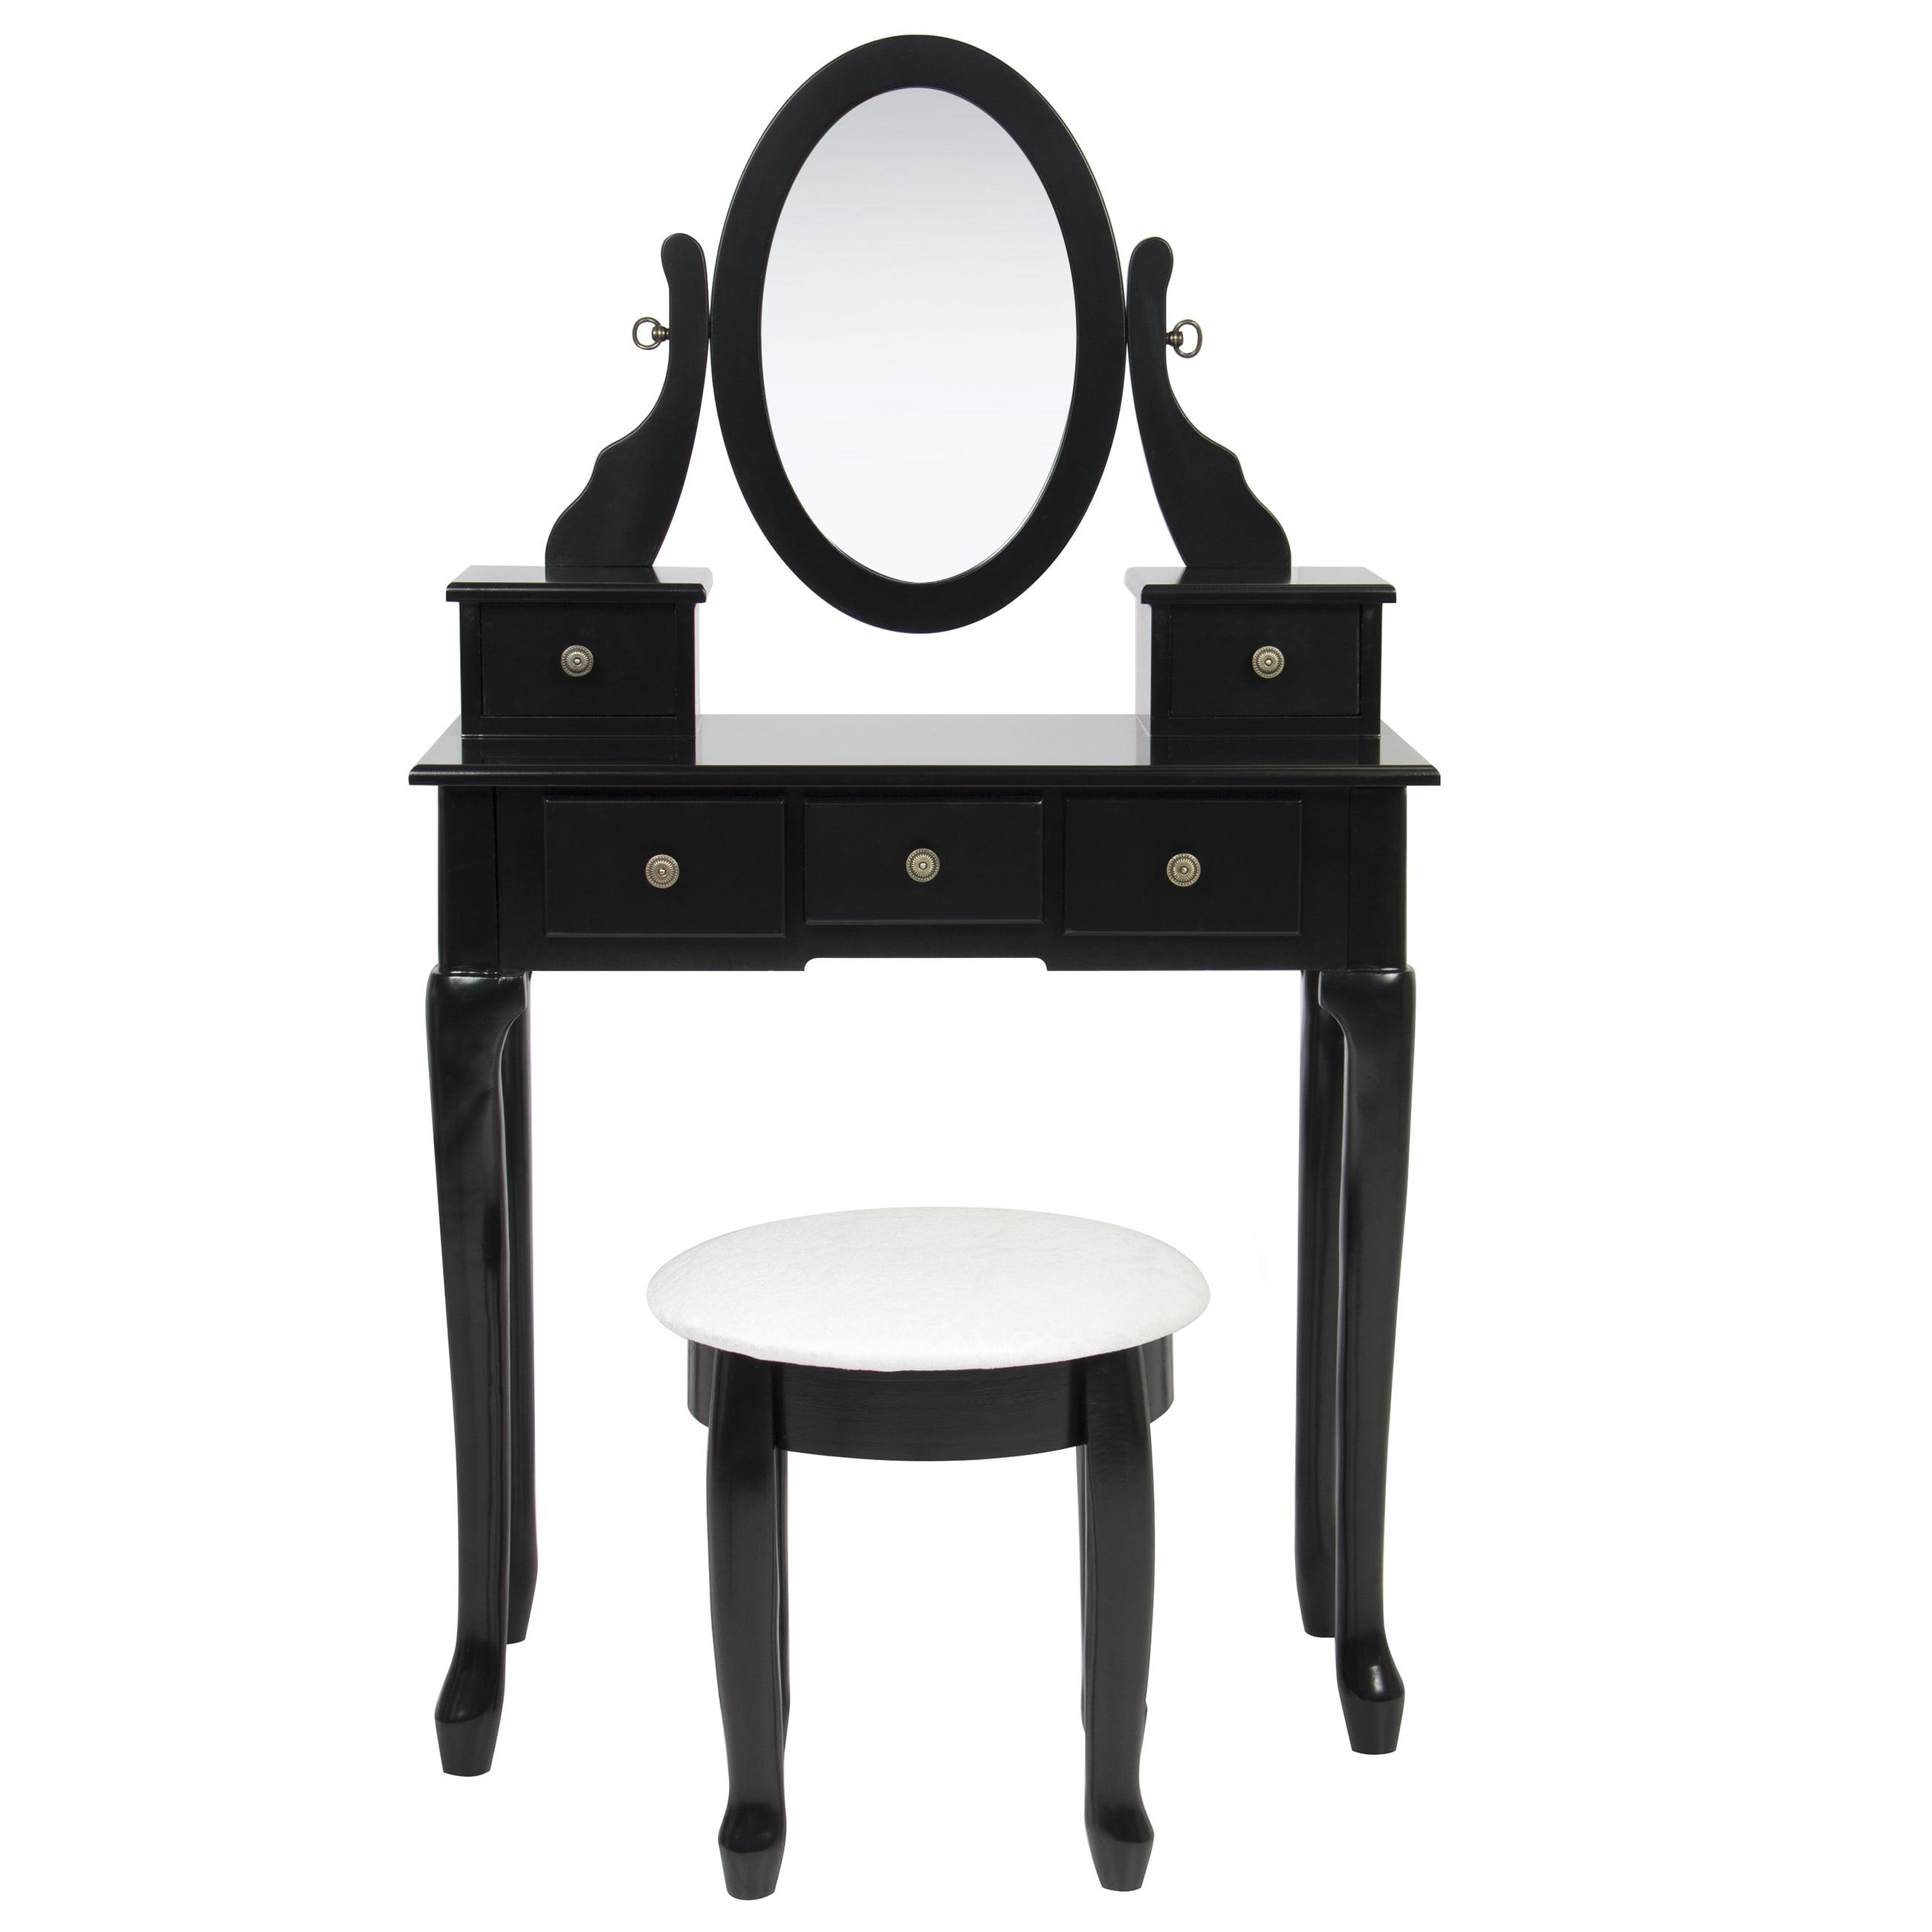 Best Choice Products Bathroom Vanity Table Set Makeup Desk Hair Dressing Organizer Black